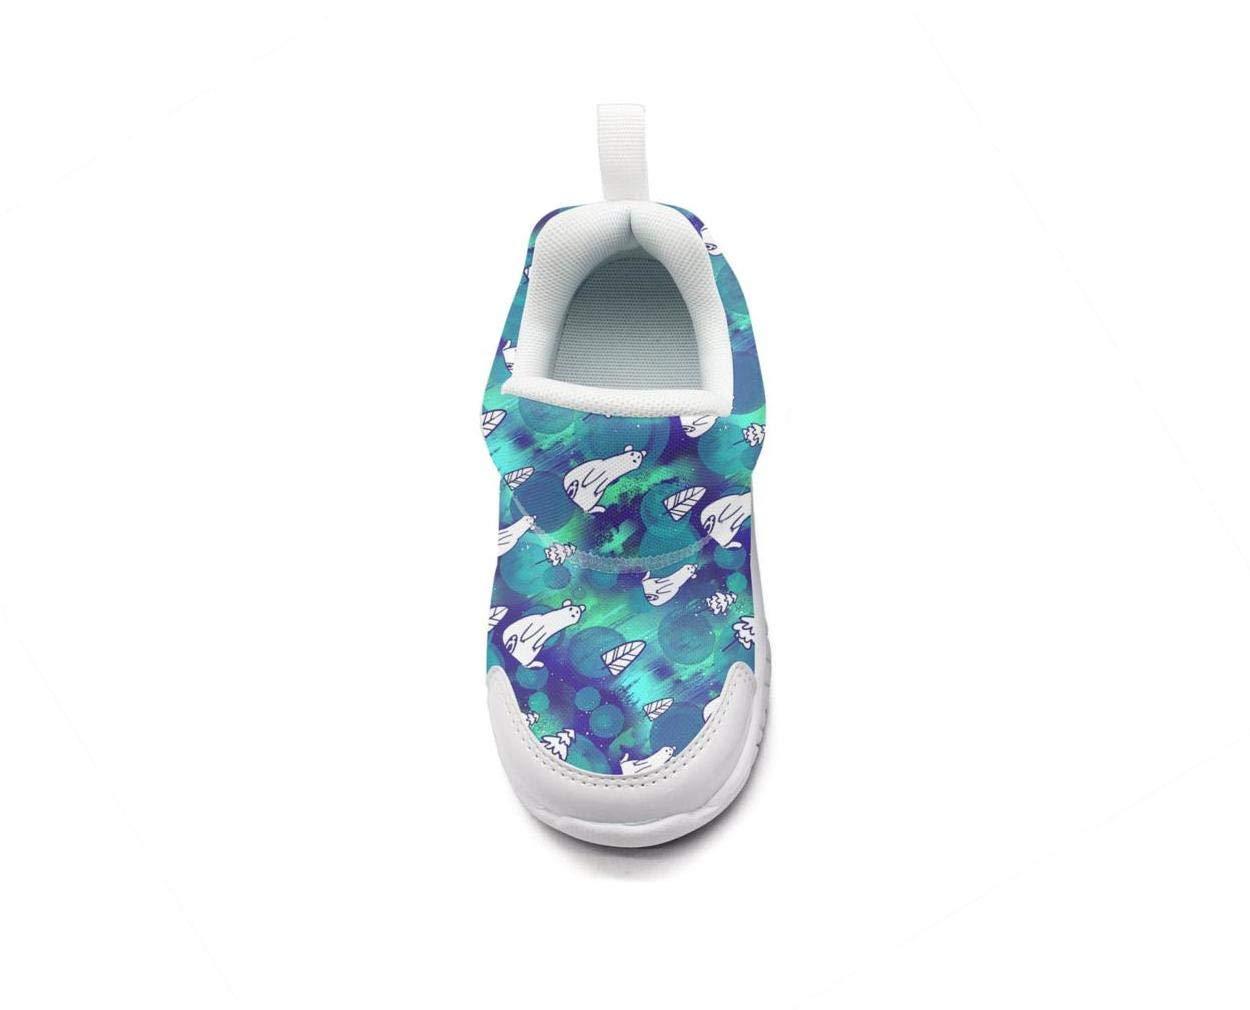 ONEYUAN Children Polar Bear Tree Kid Casual Lightweight Sport Shoes Sneakers Running Shoes